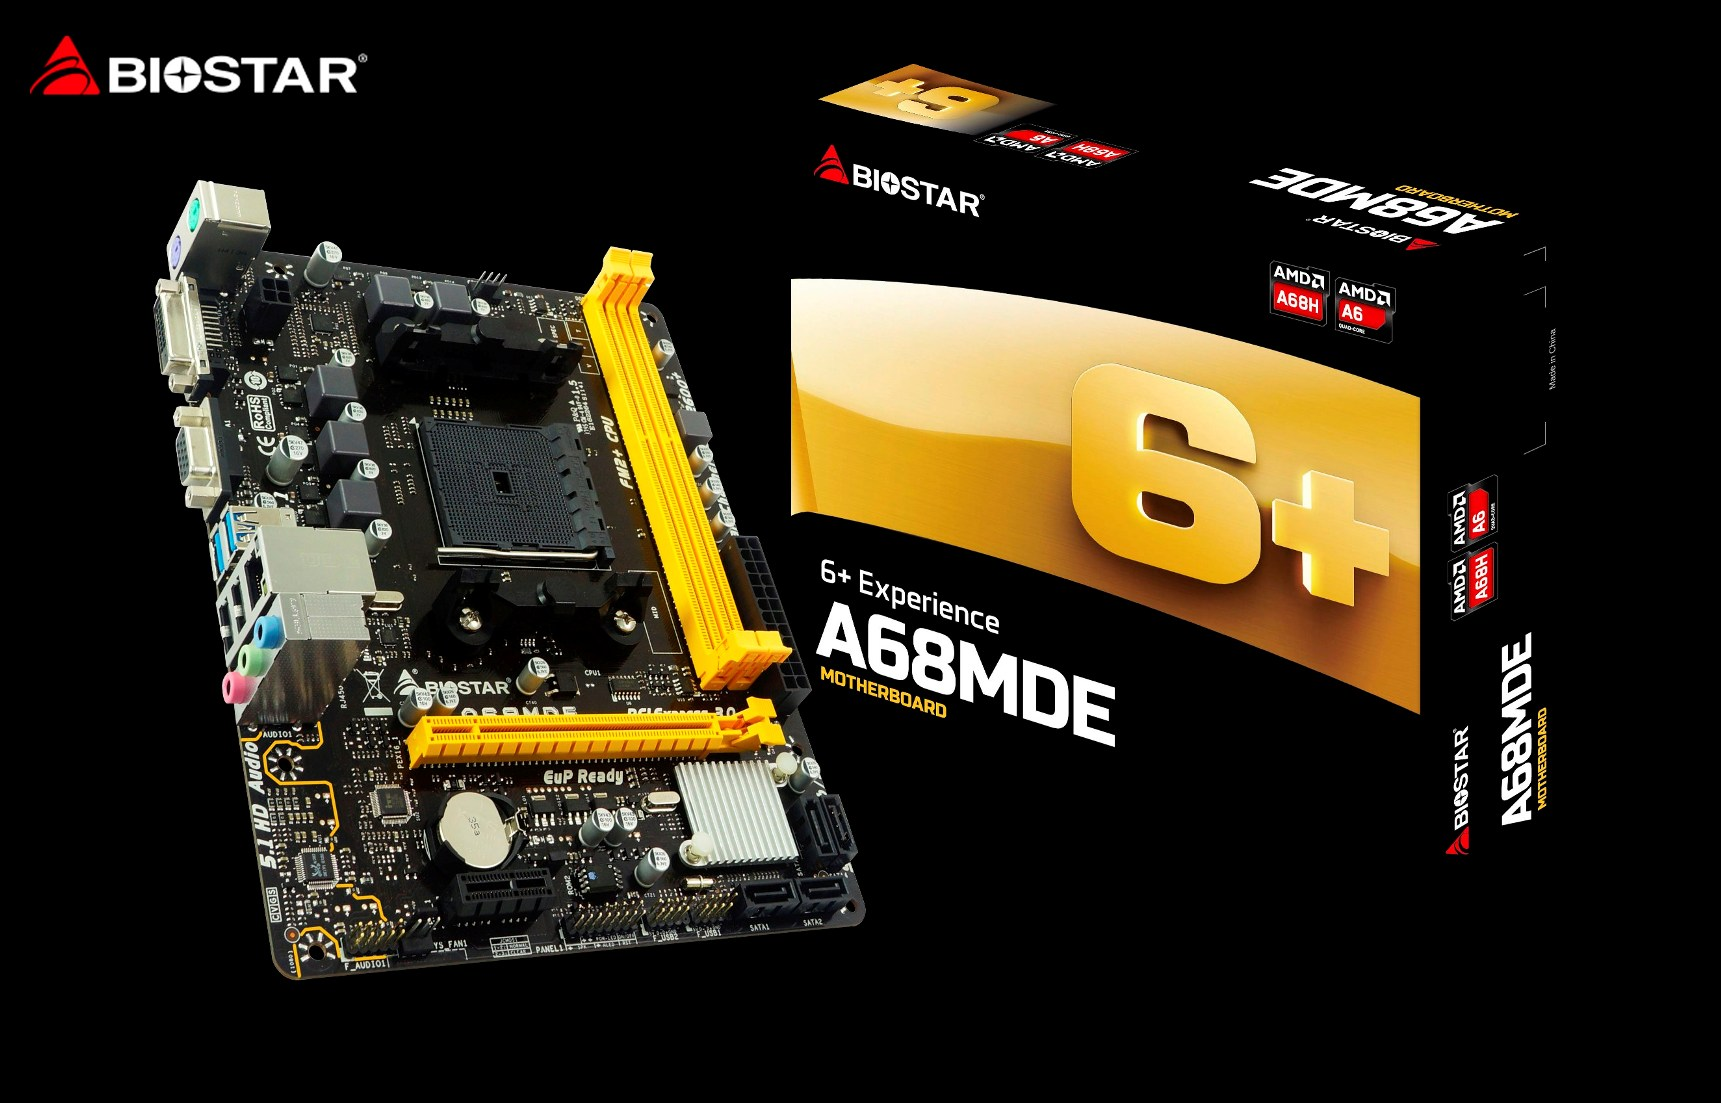 BIOSTAR Outs New A68MDE AMD FM2+ Motherboard